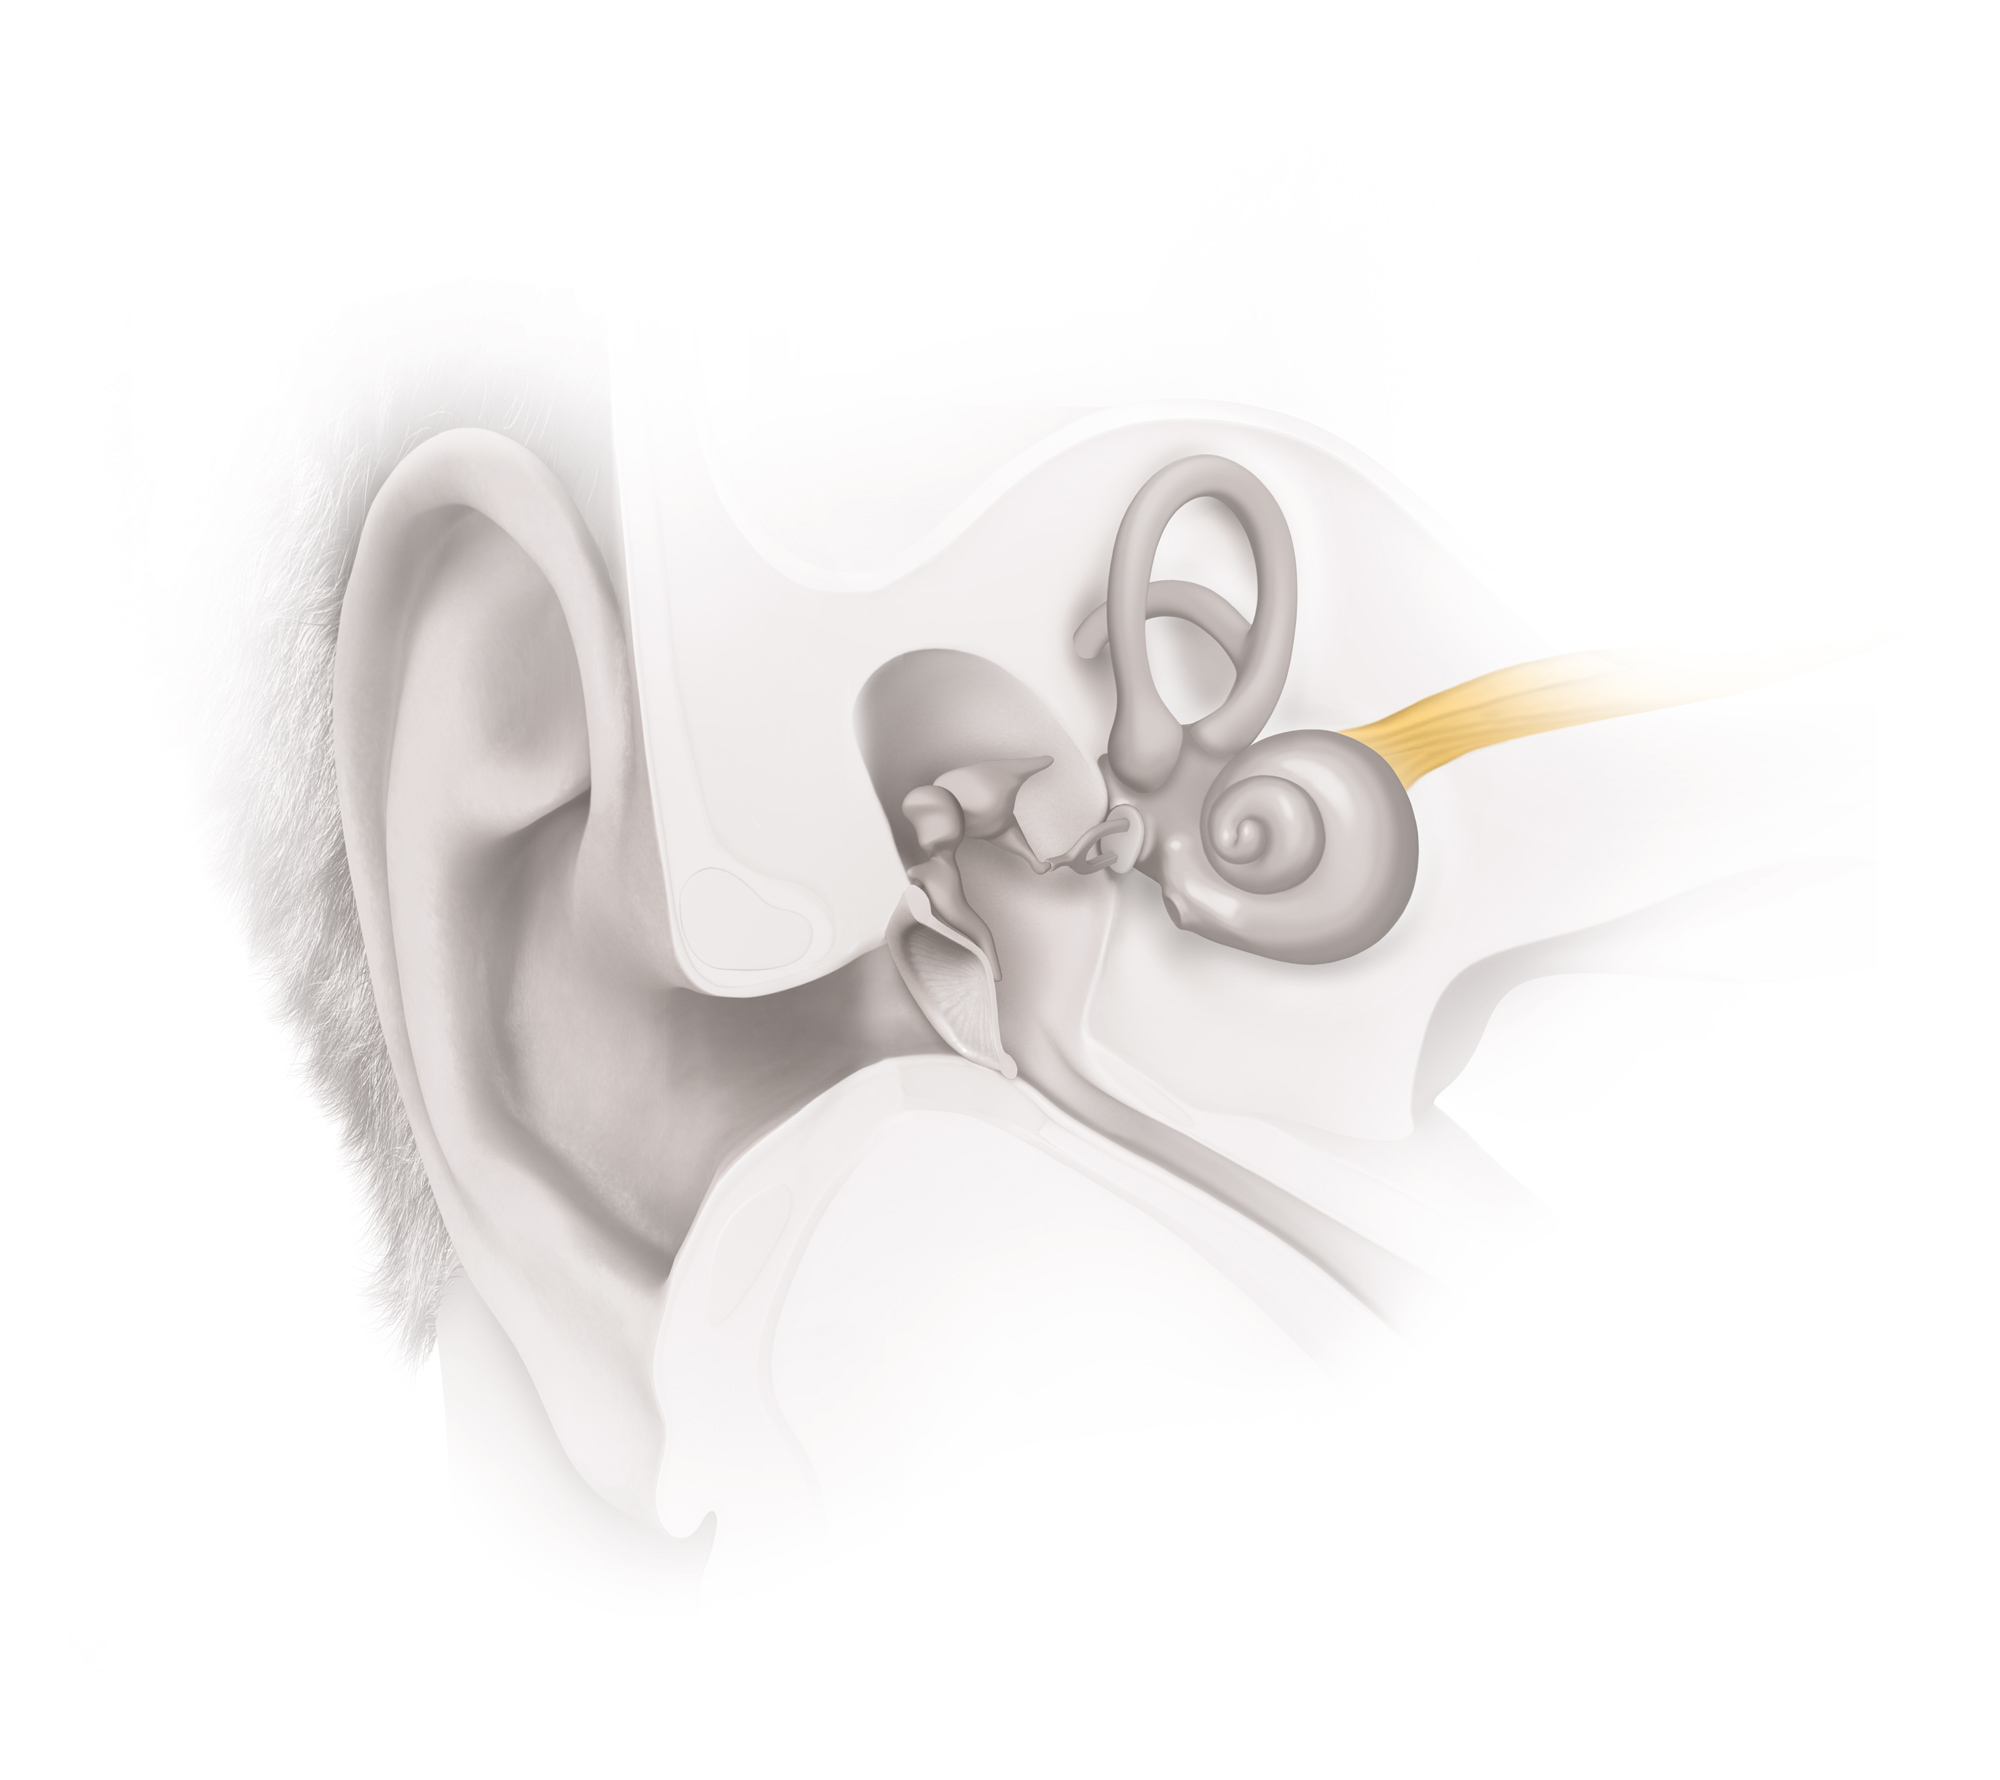 Auditory Brainstem Illustration